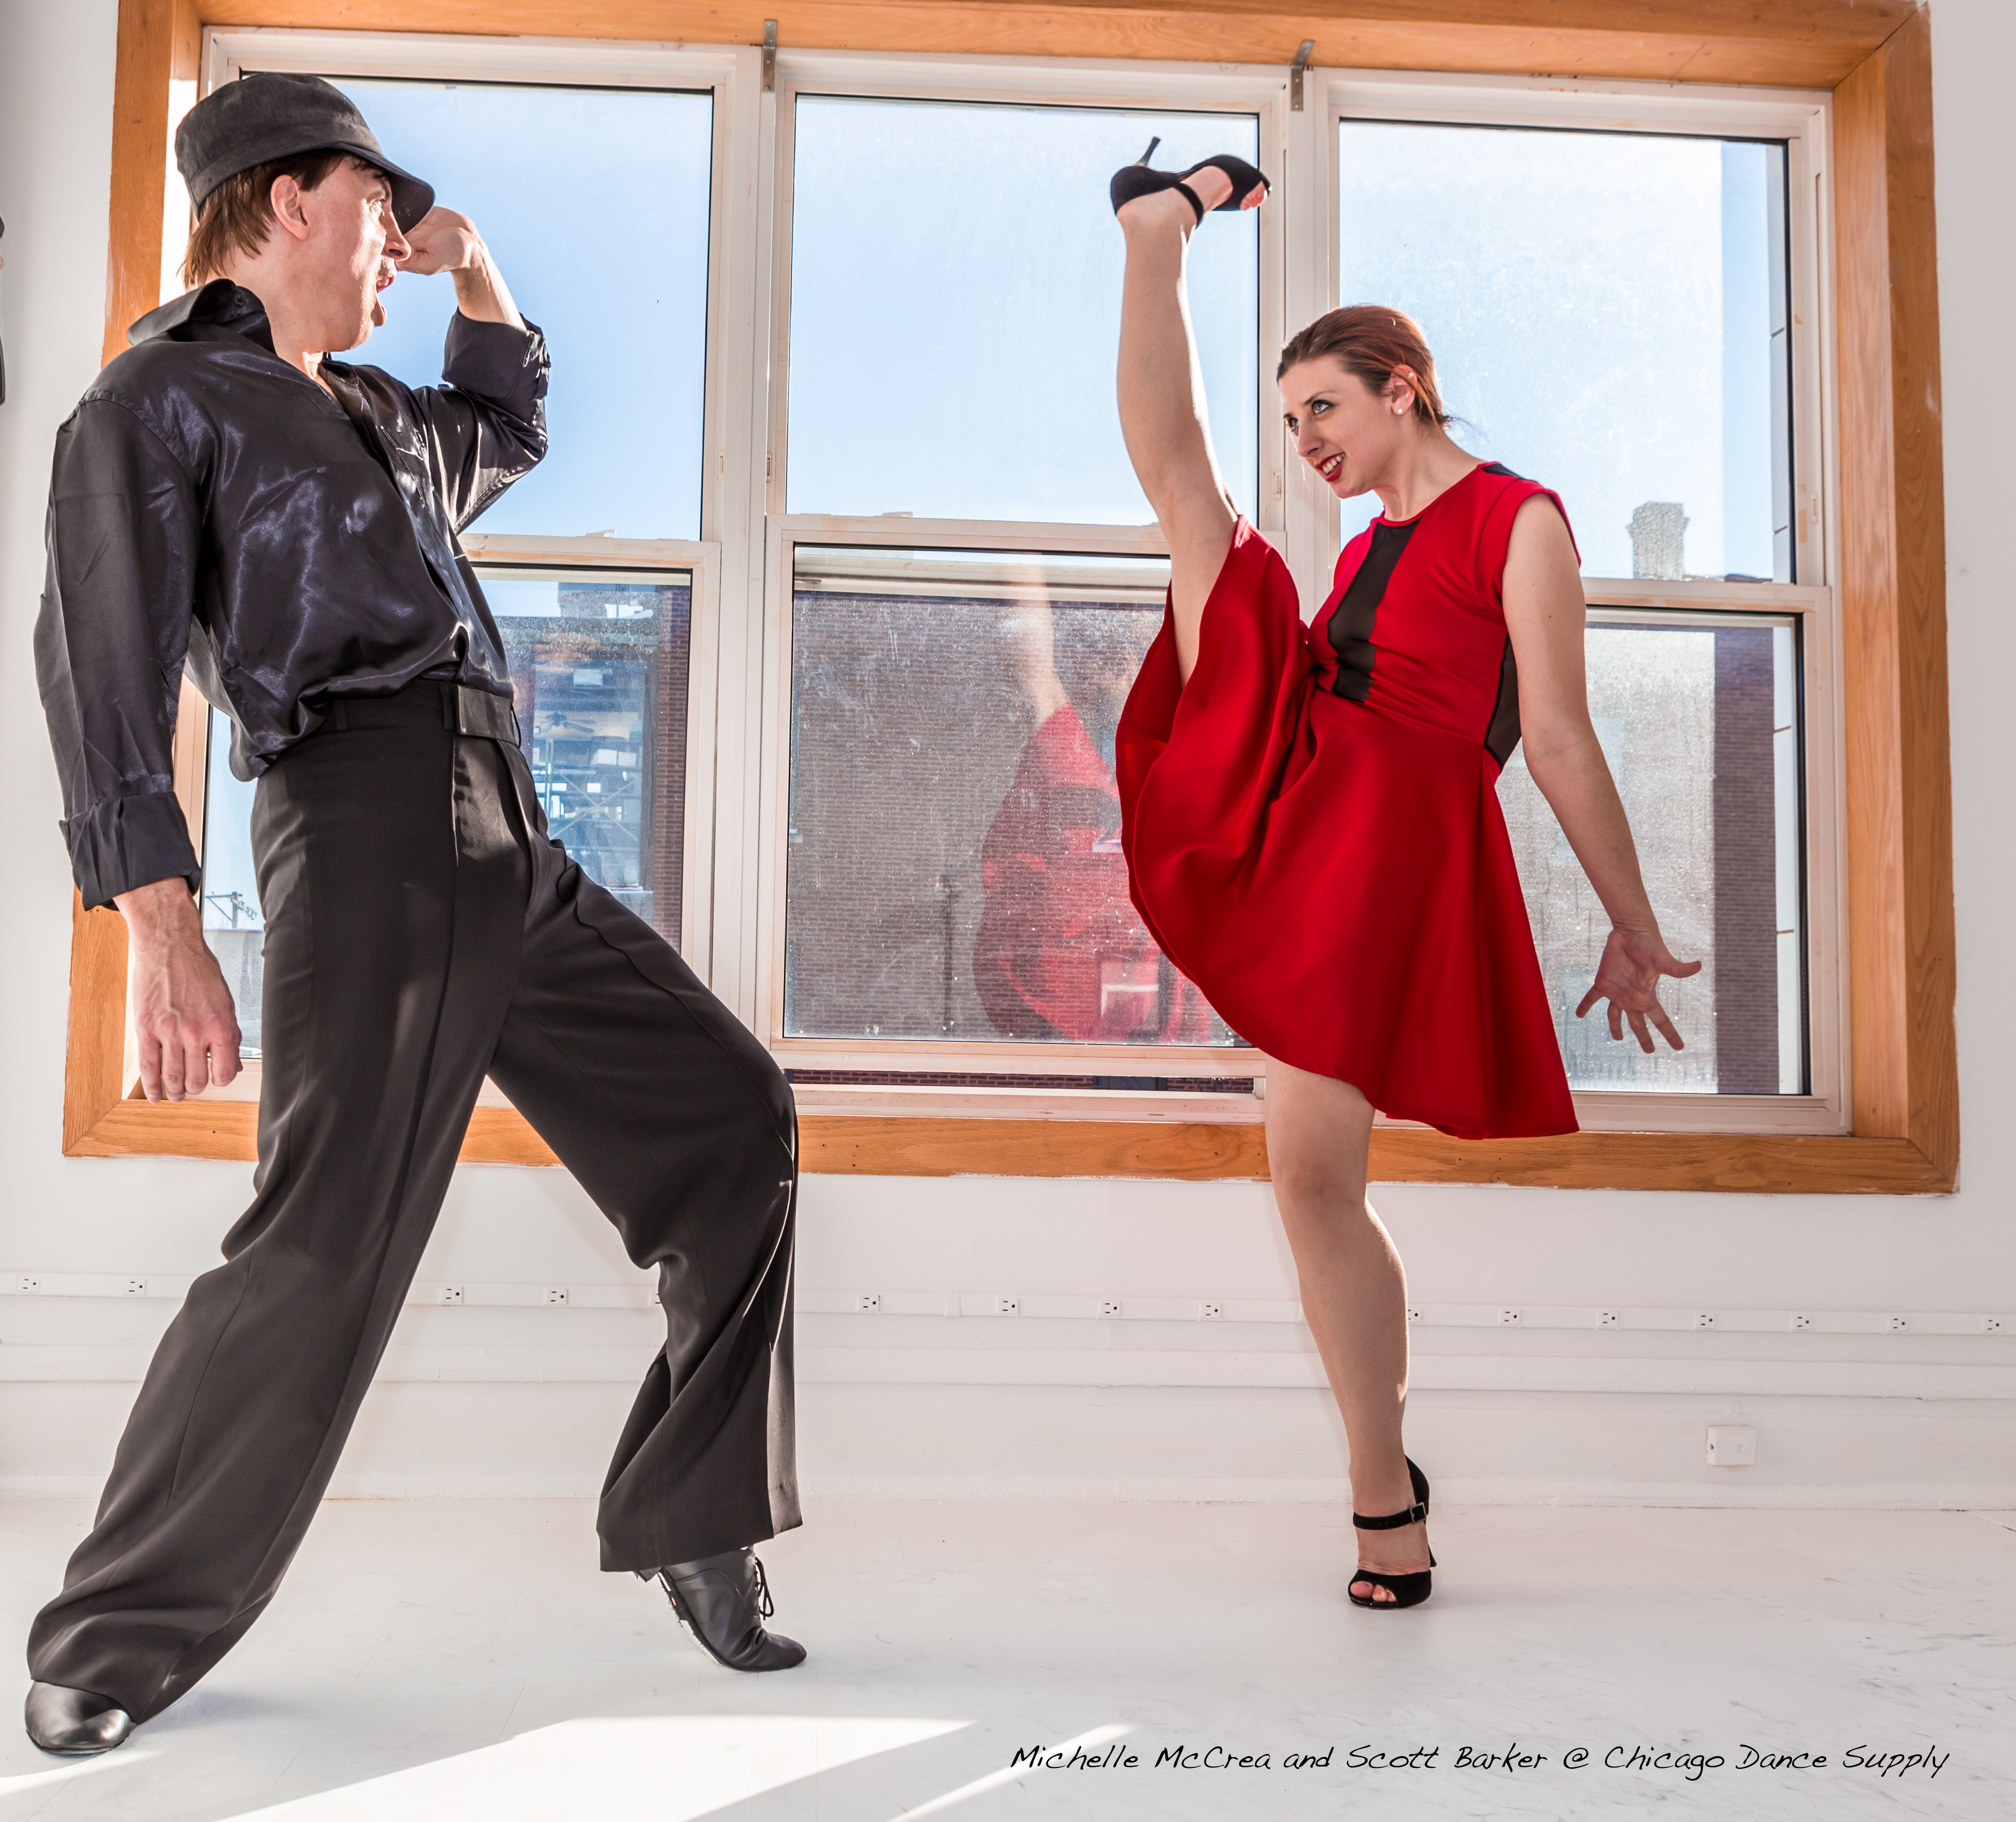 Michelle McCrea and Scott Barker at Chicago Dance Supply